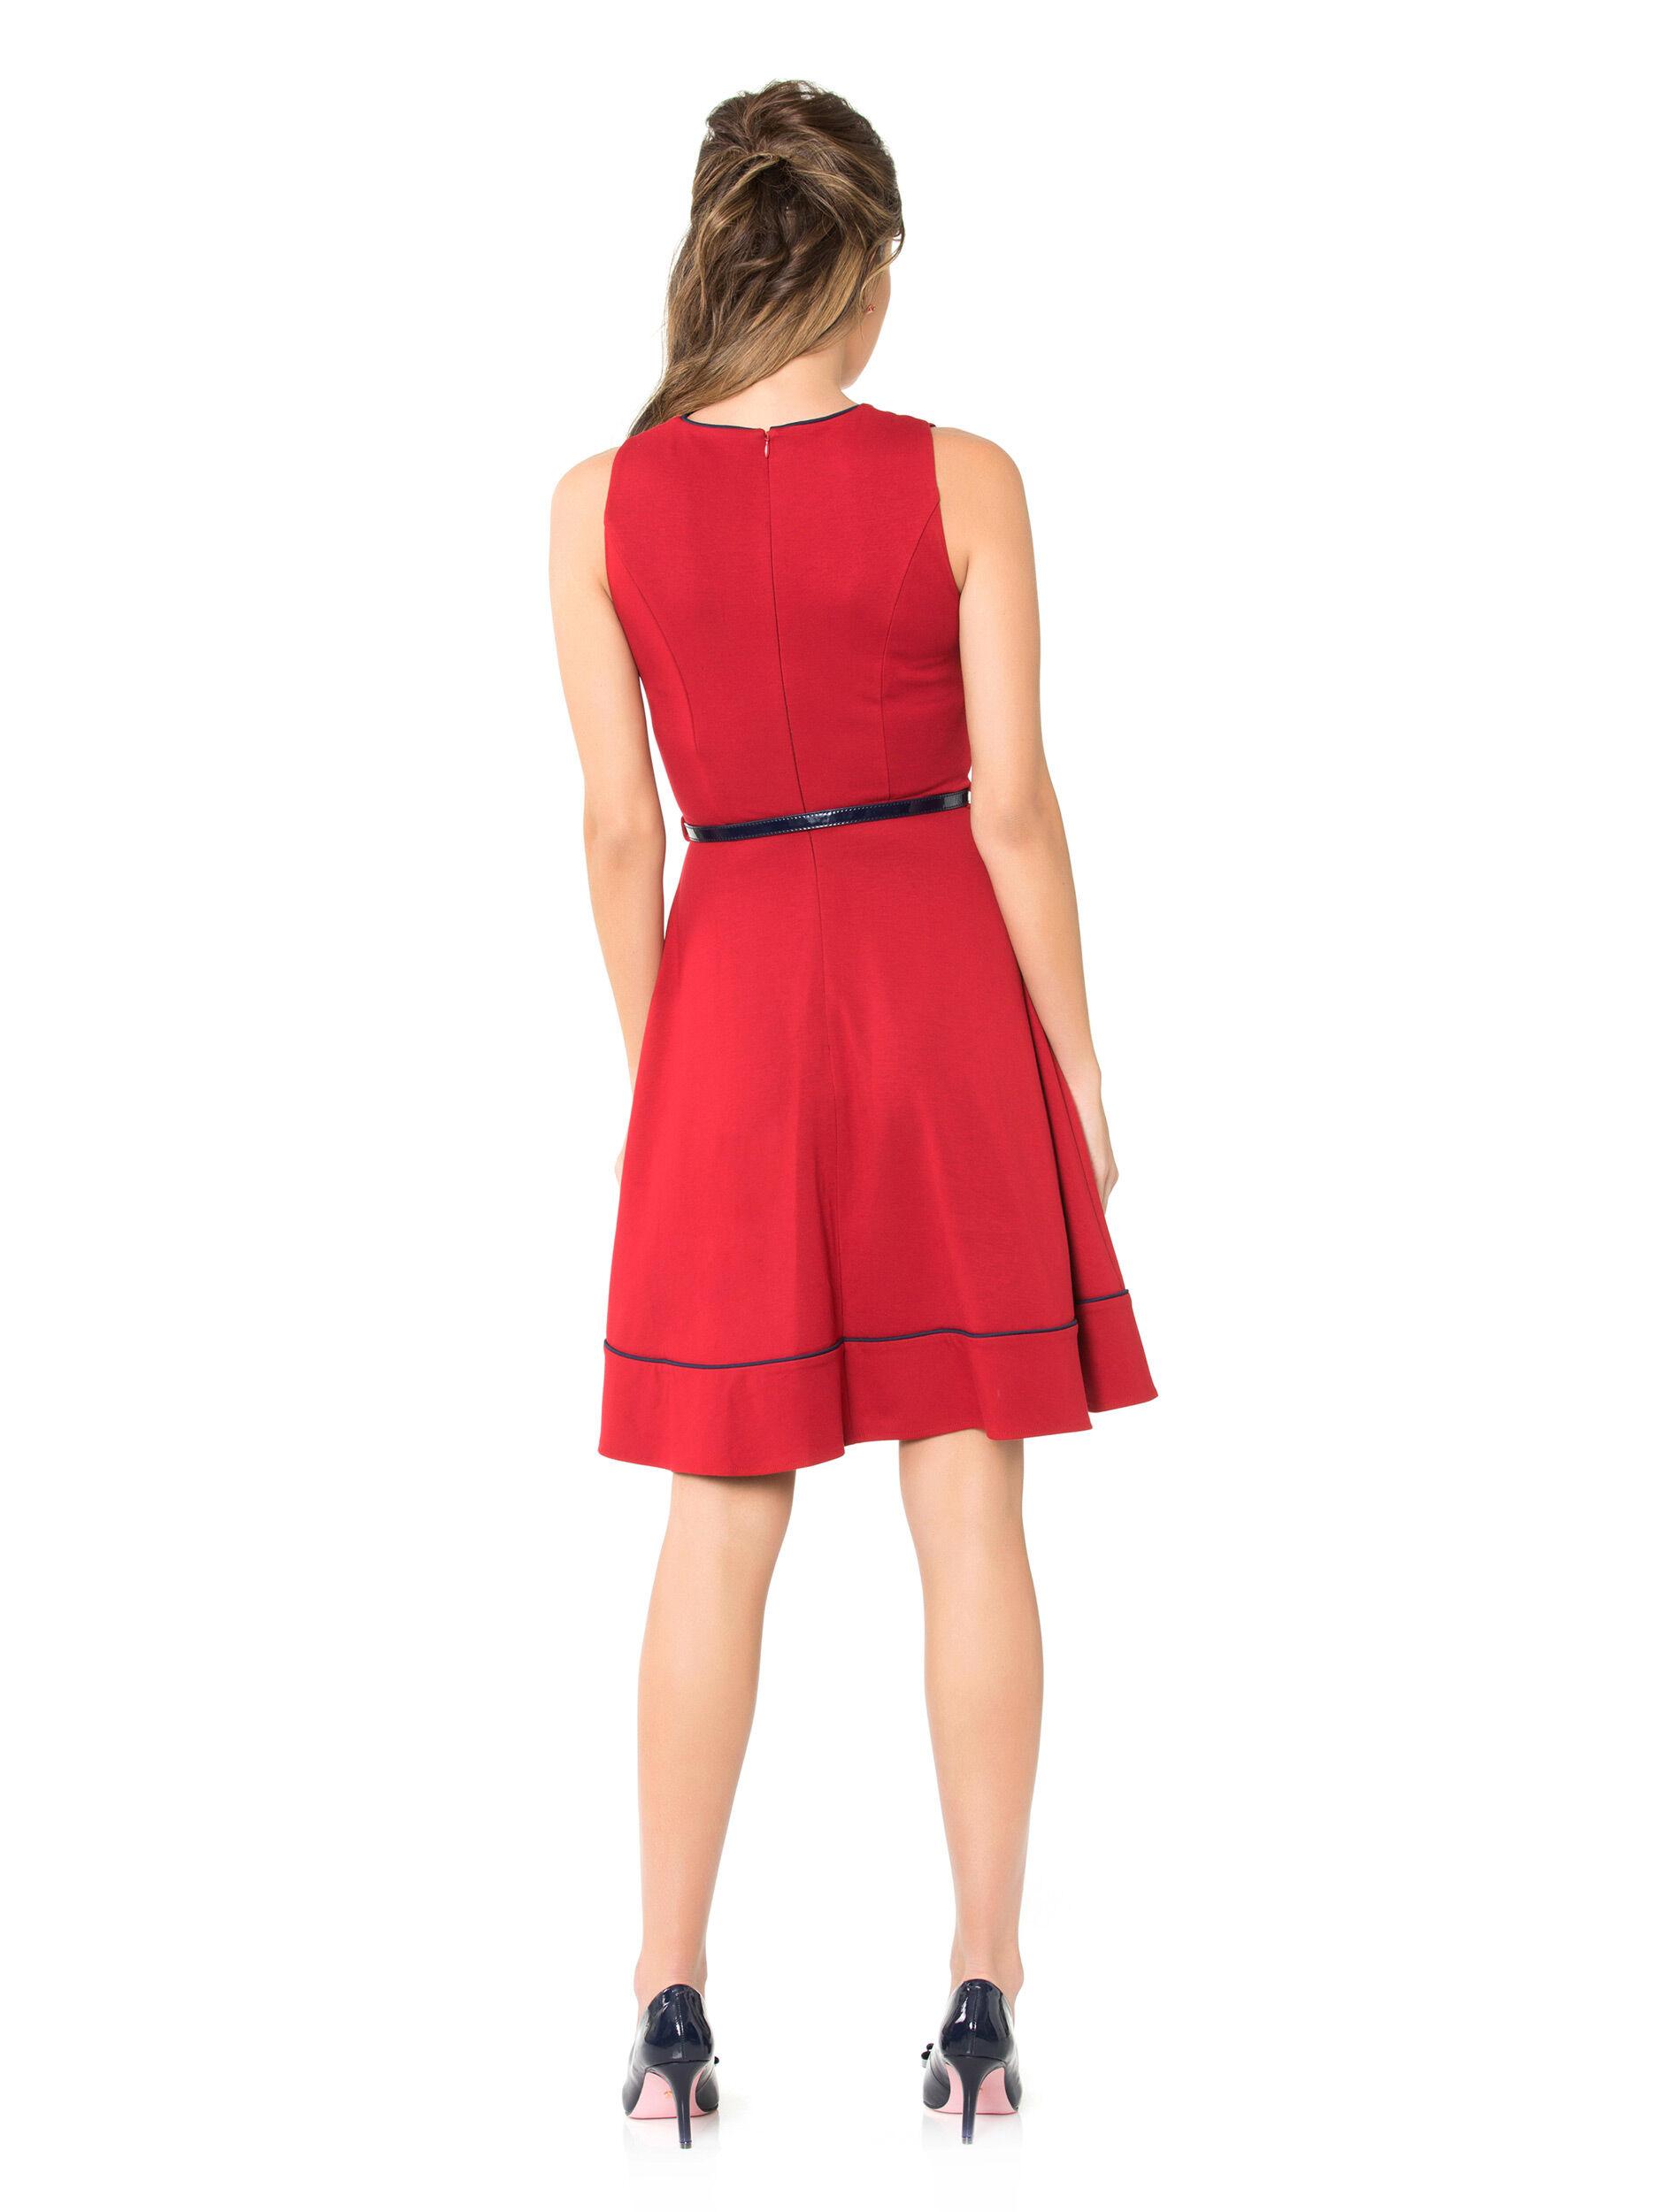 Love Locket Dress